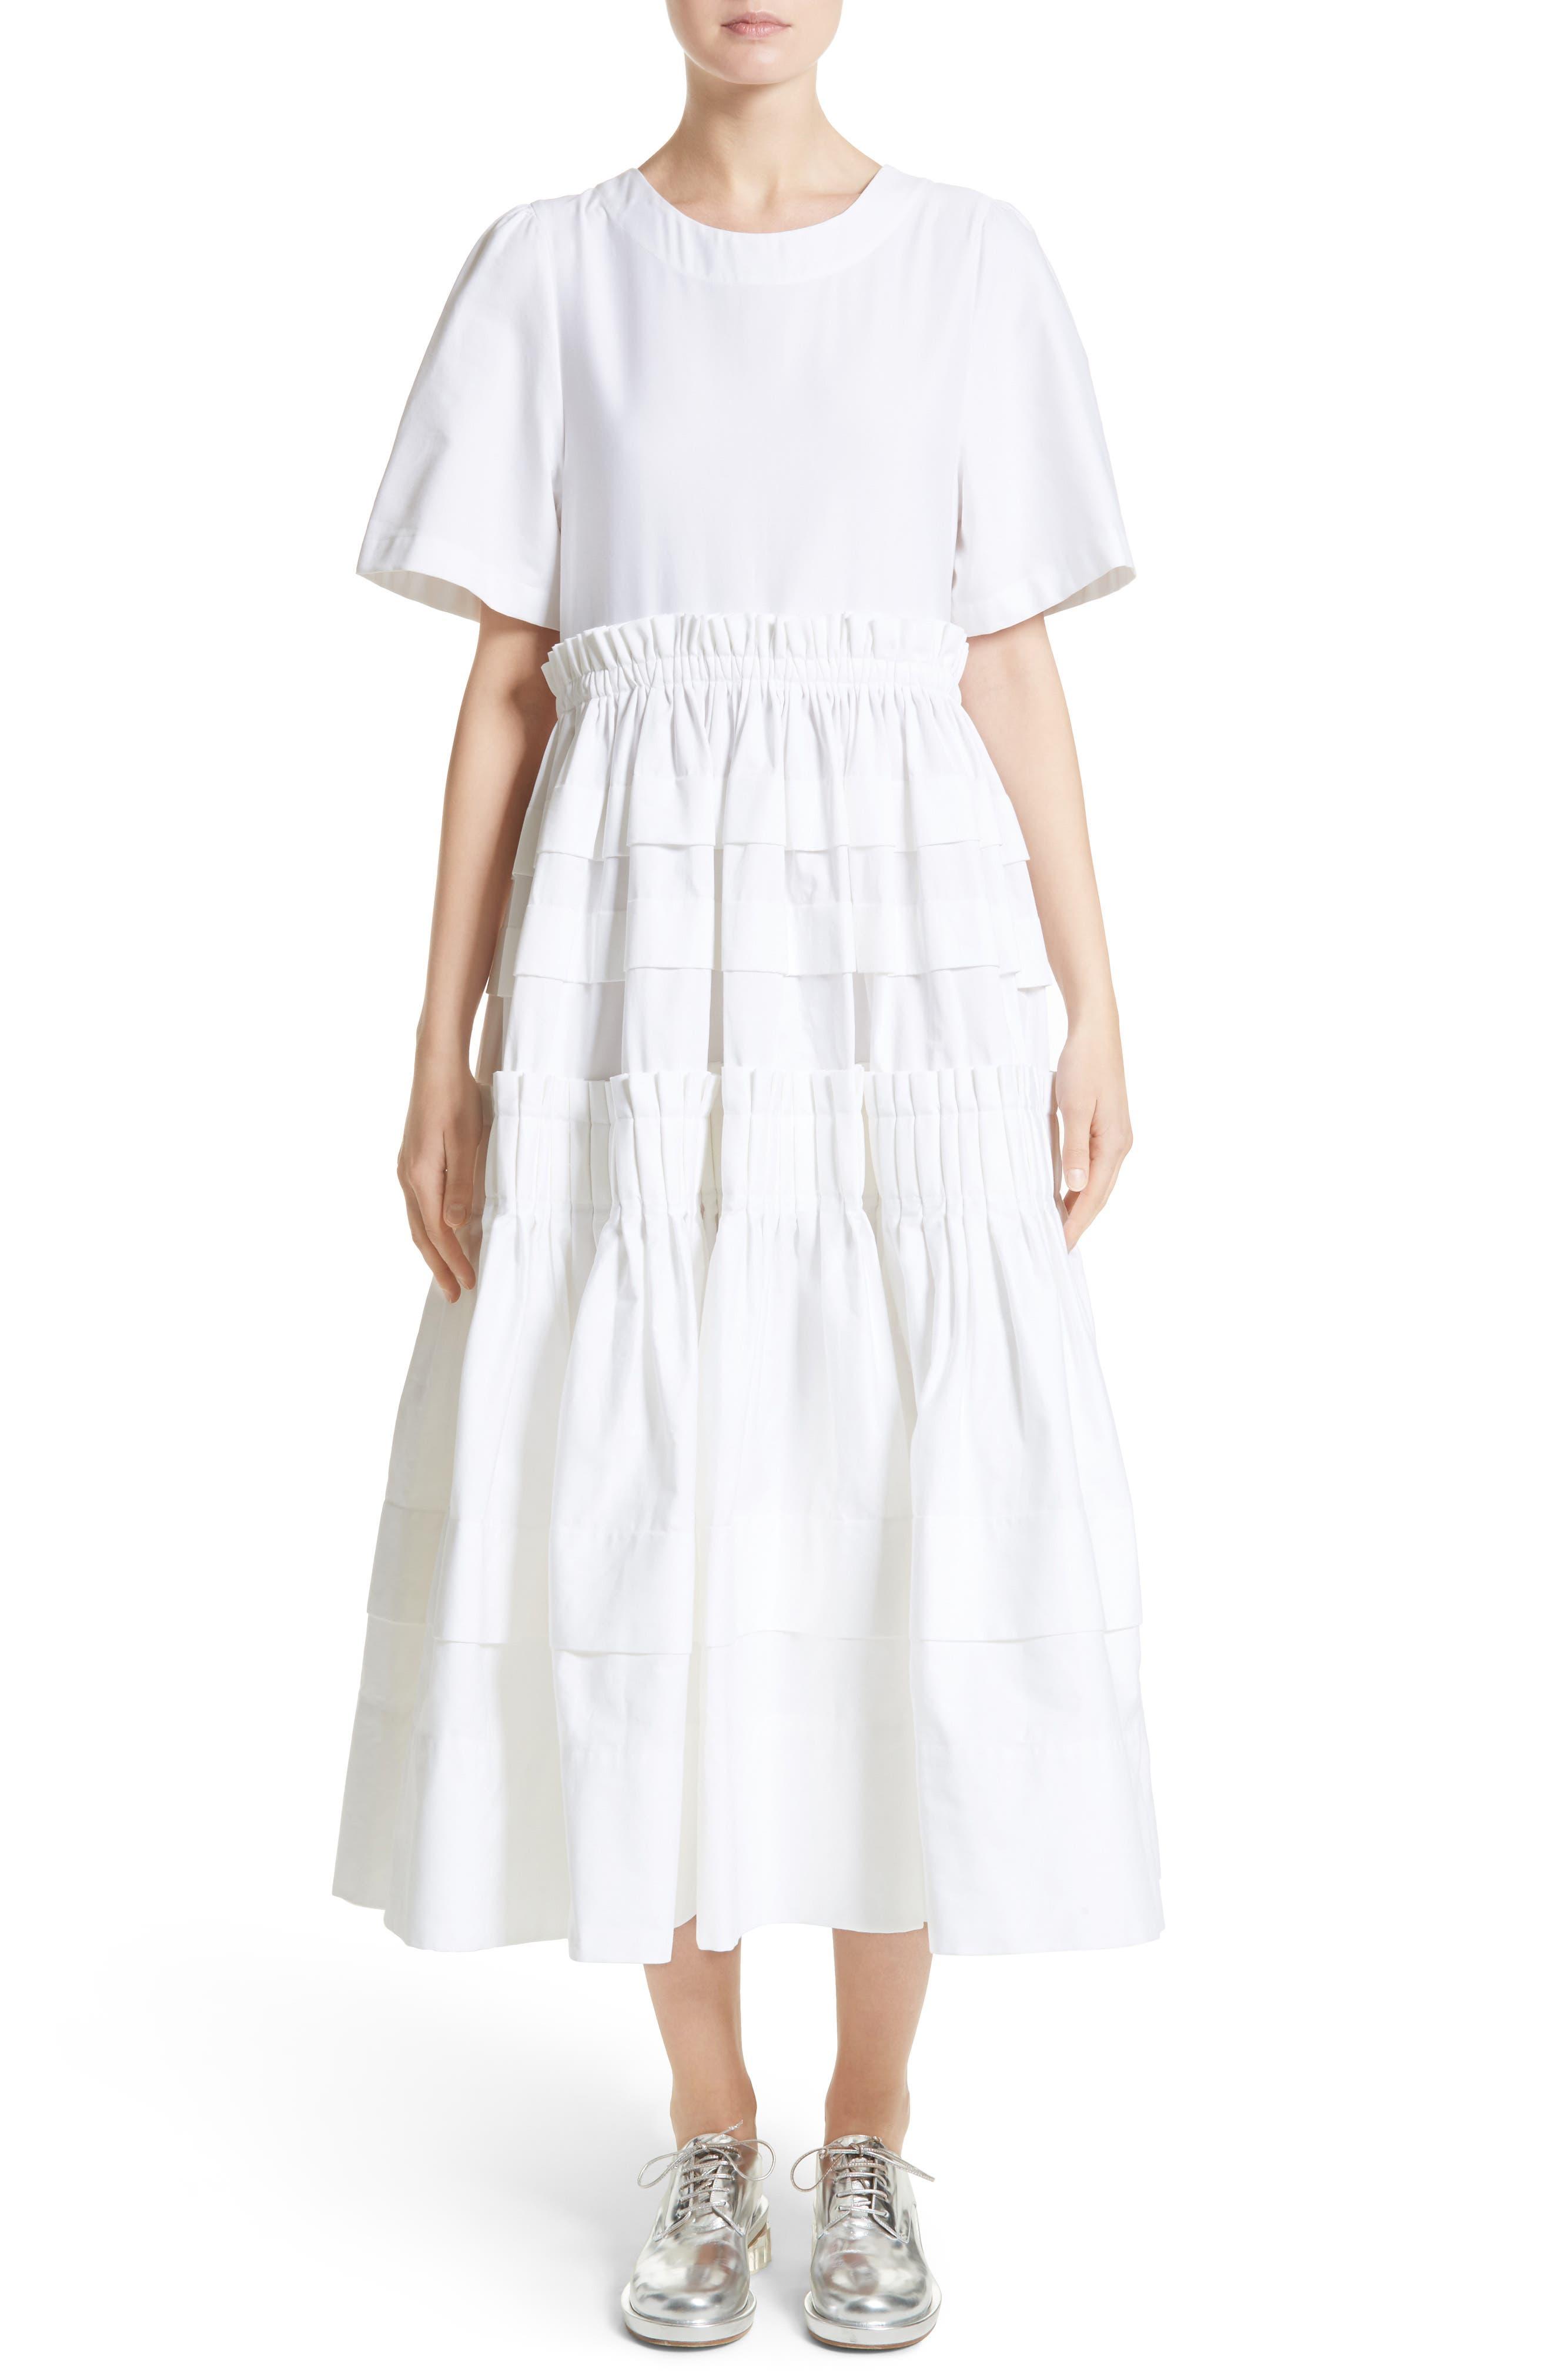 Mathilda Maxi Dress,                         Main,                         color, White